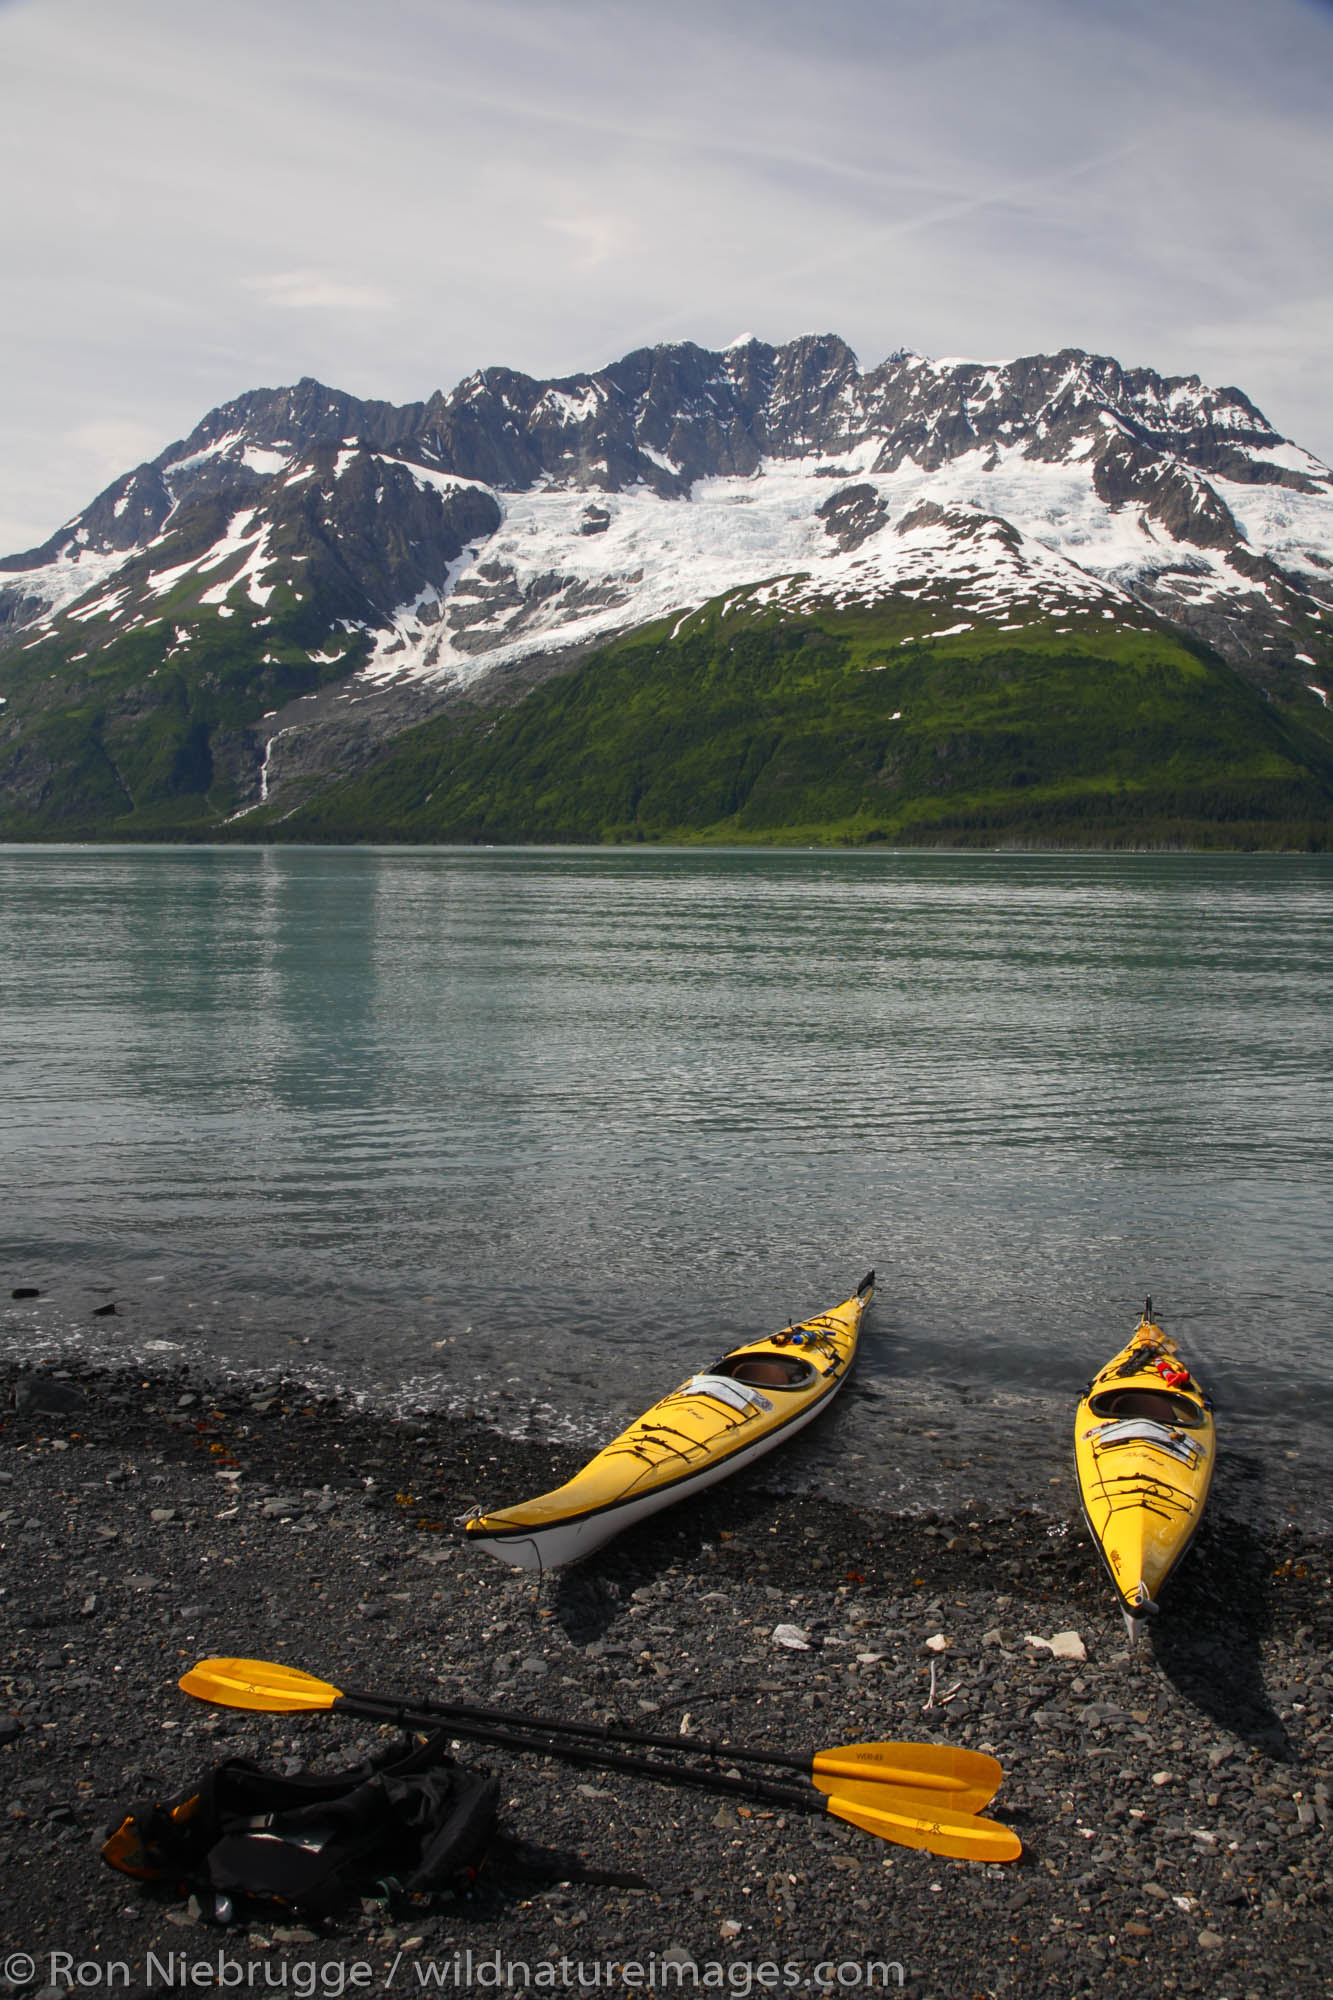 Forest Service kayak patrol in Harriman Fiord, Prince William Sound, Chugach National Forest, Alaska.